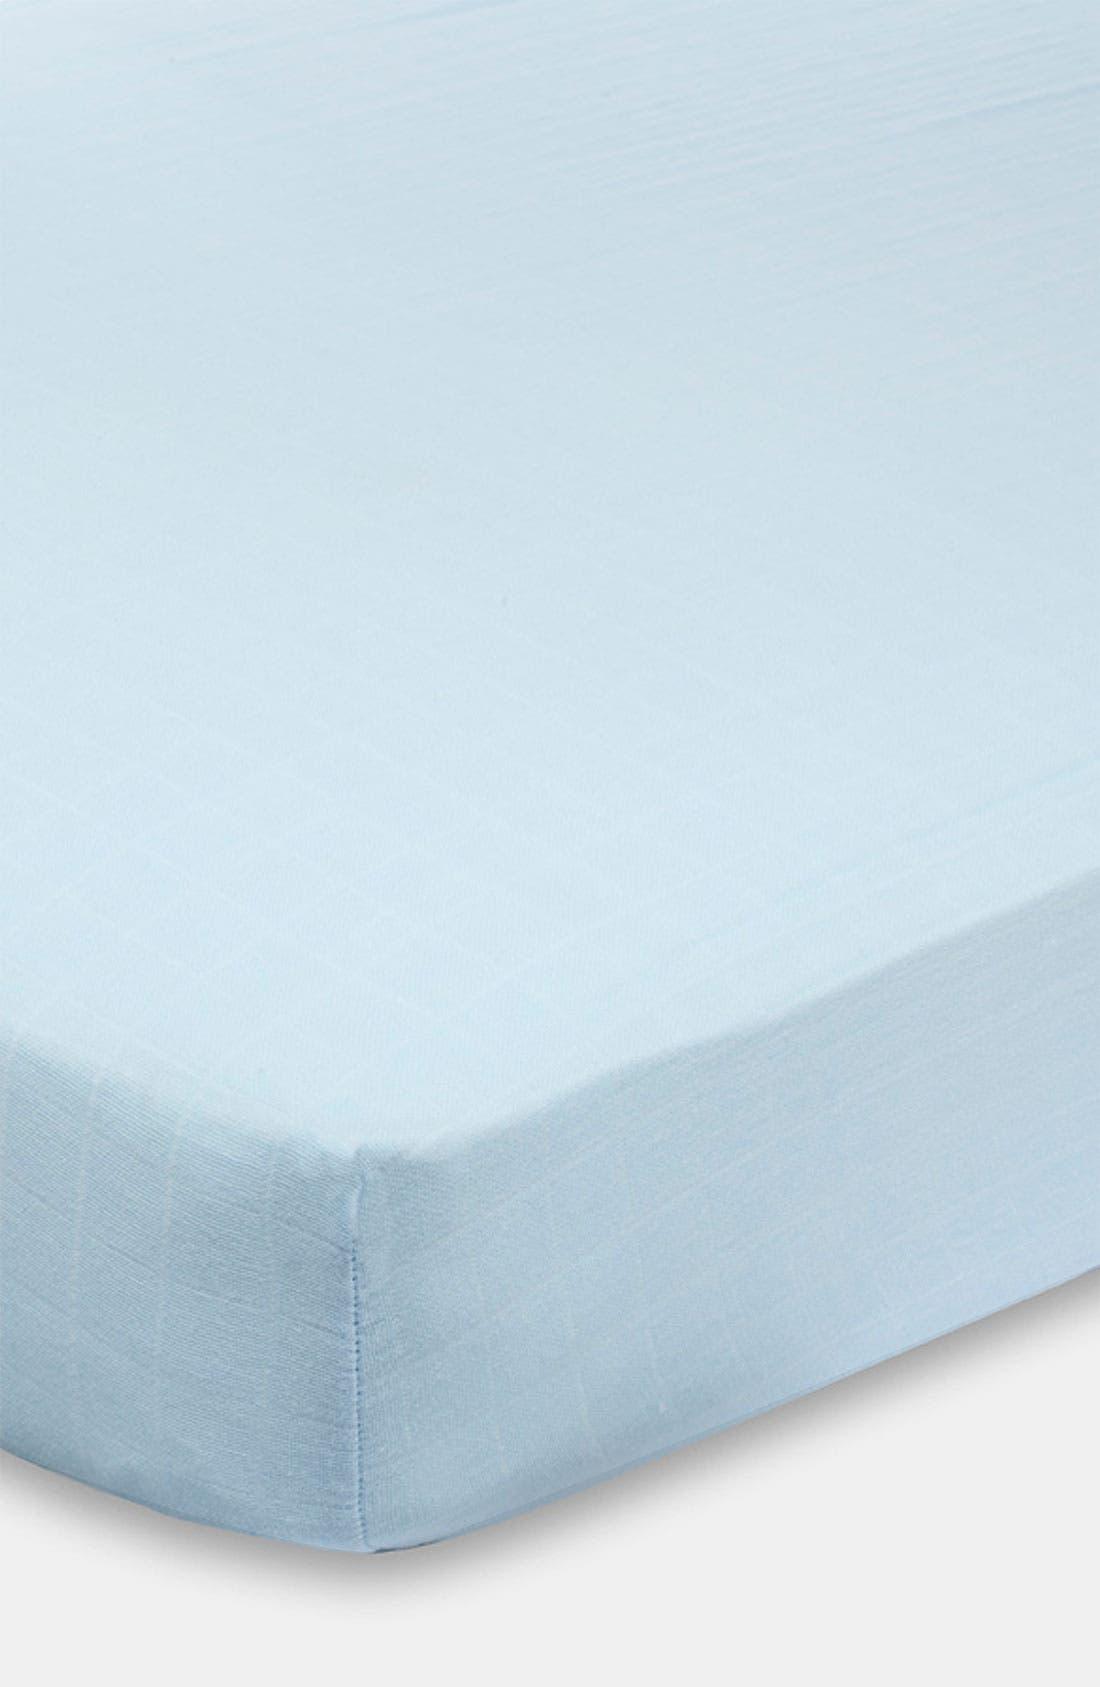 Main Image - aden + anais Classic Crib Sheet